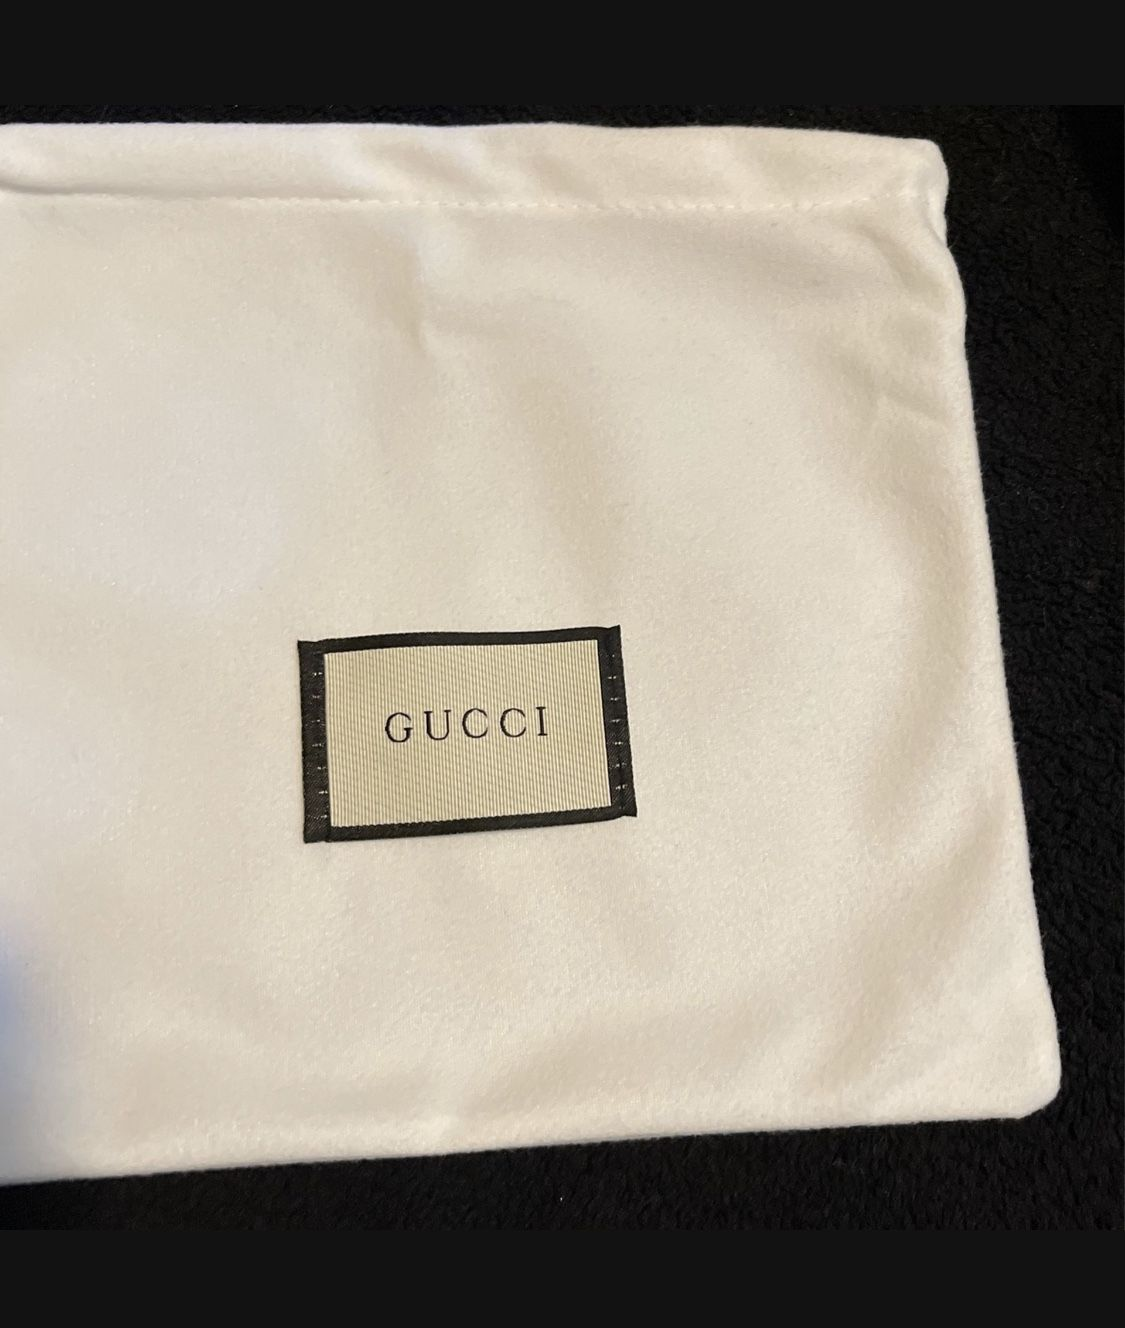 GUCCI Dionysus Supreme Chain wallet